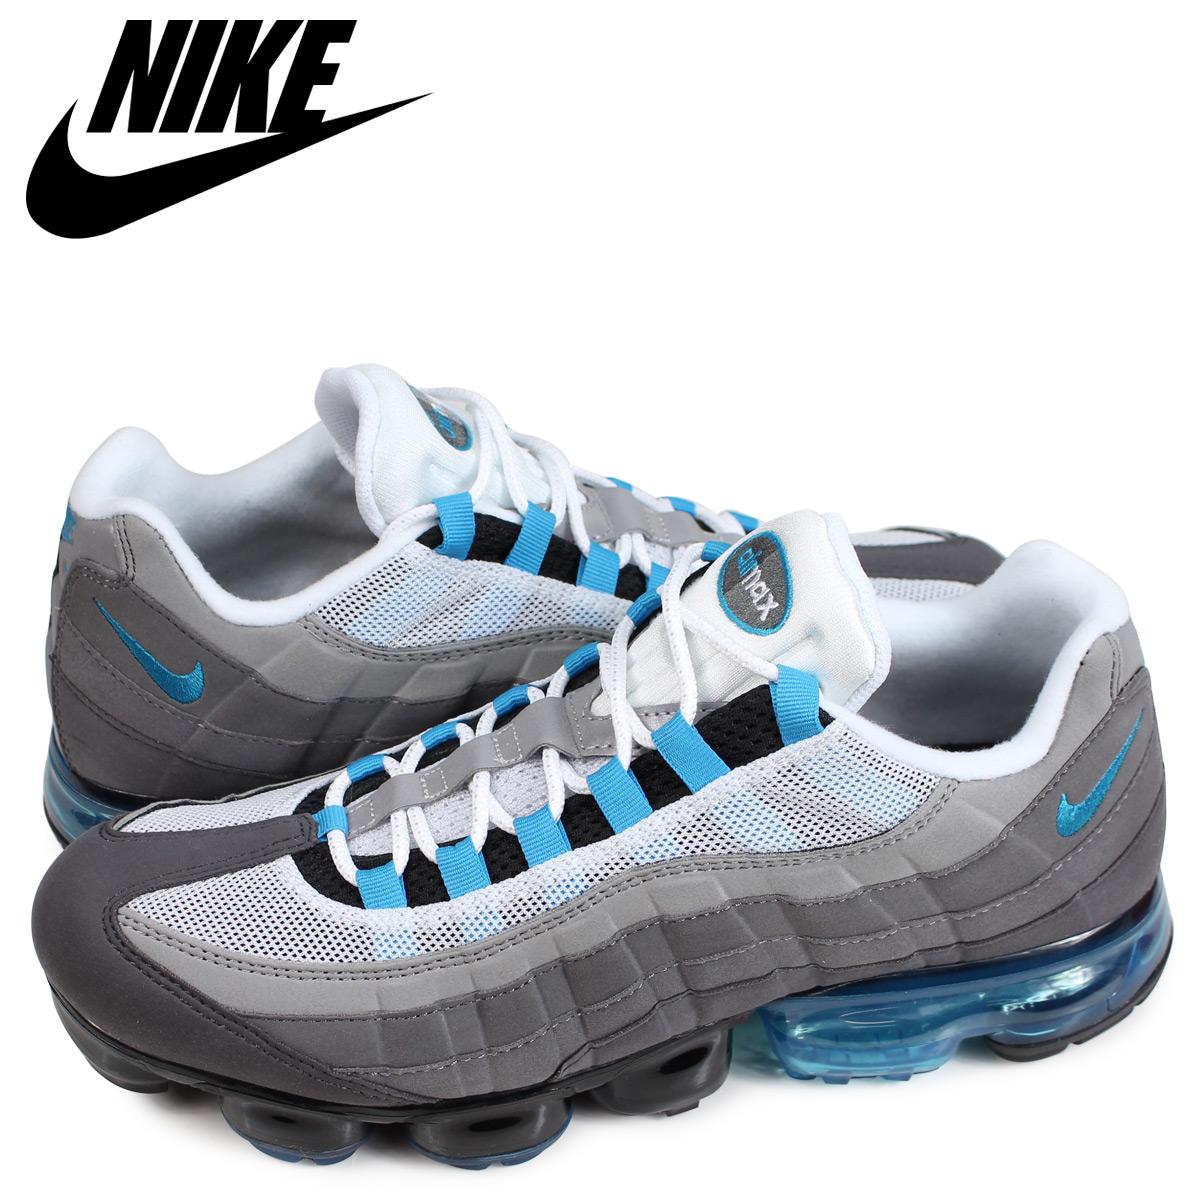 bce3df4695cbfc SneaK Online Shop  NIKE AIR VAPORMAX 95 Nike vapor max 95 sneakers ...